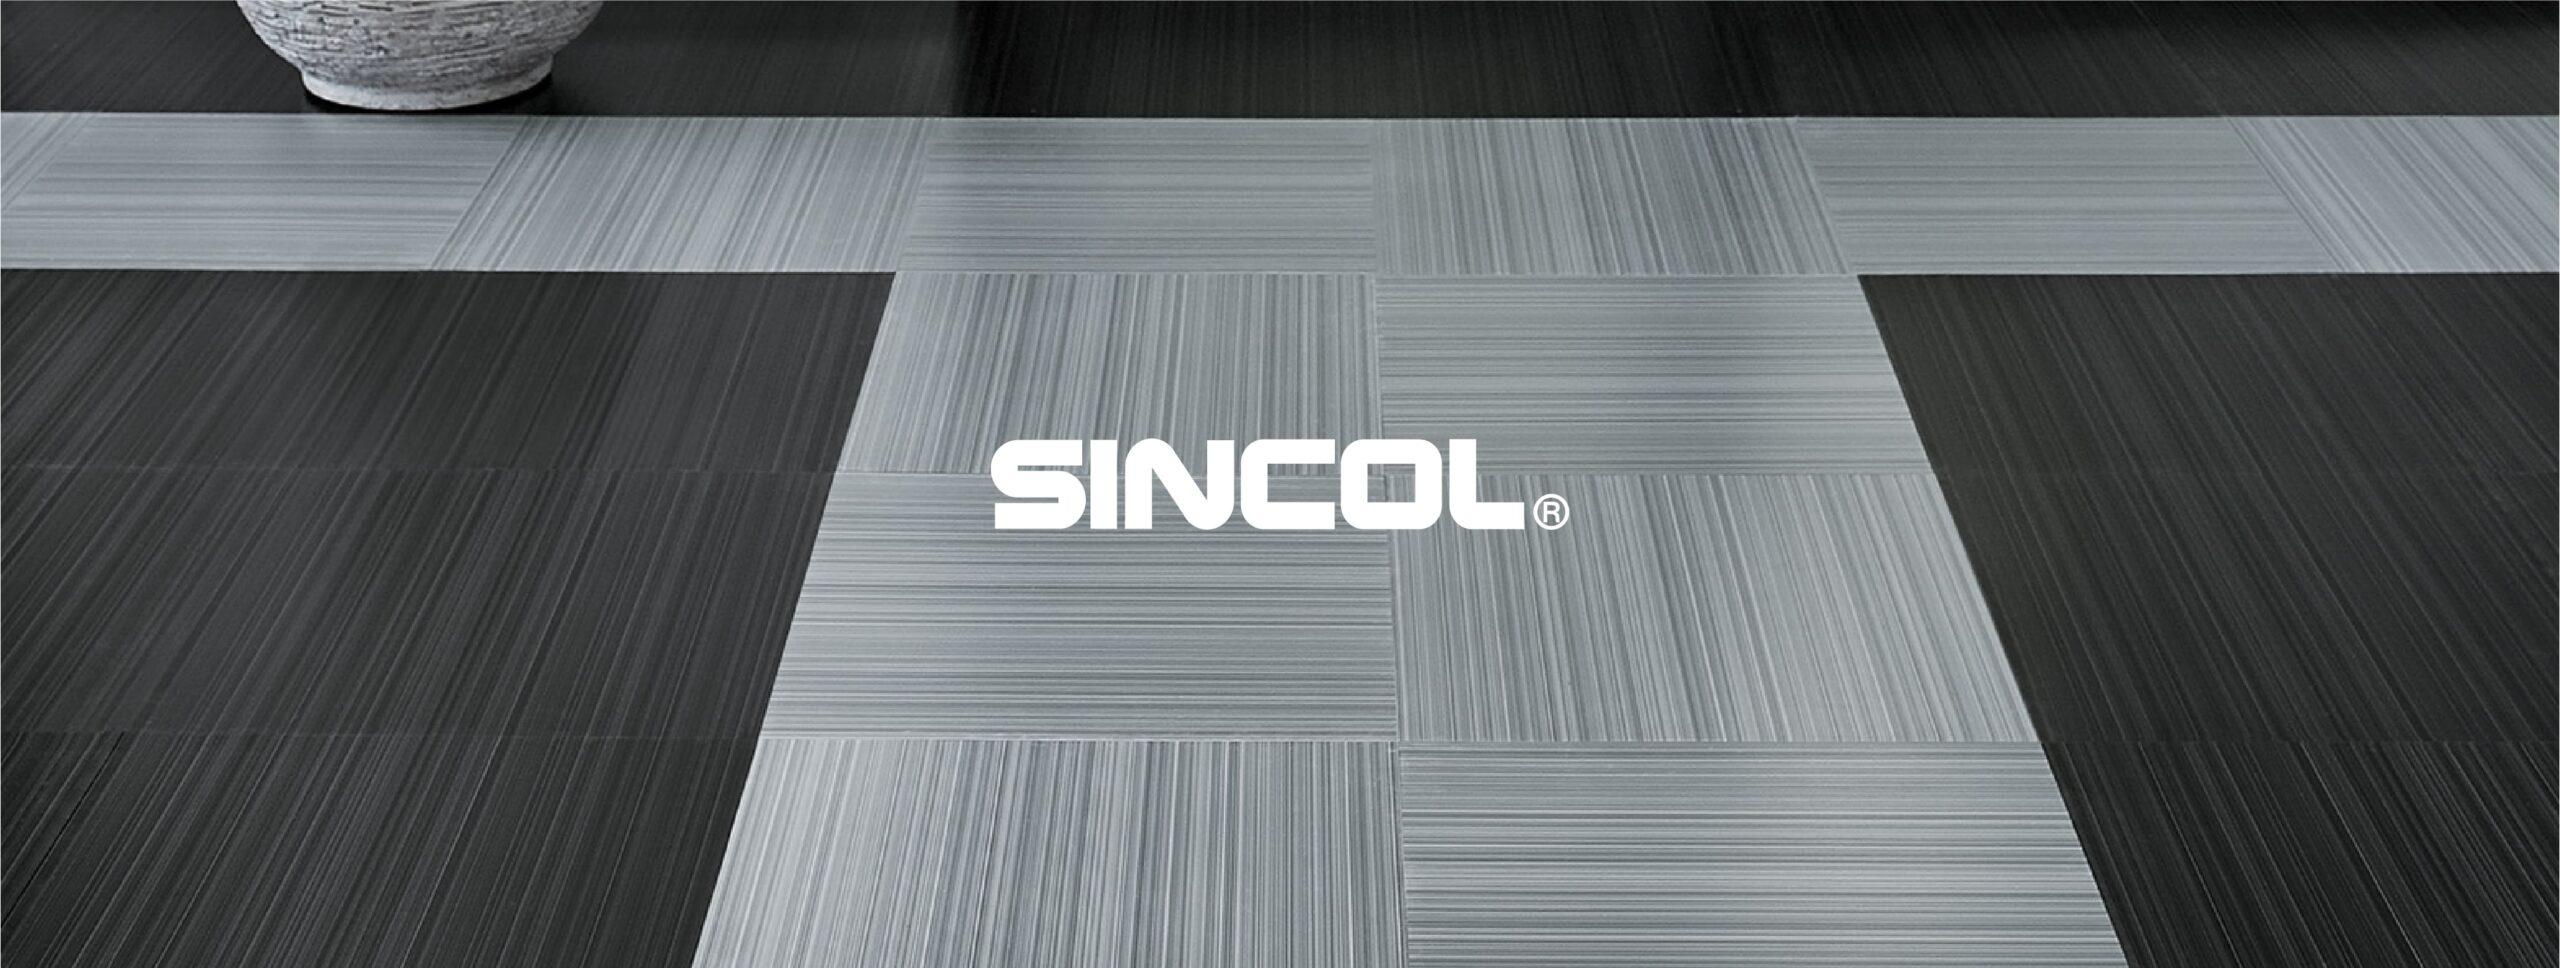 Tat Ming Flooring Sincol